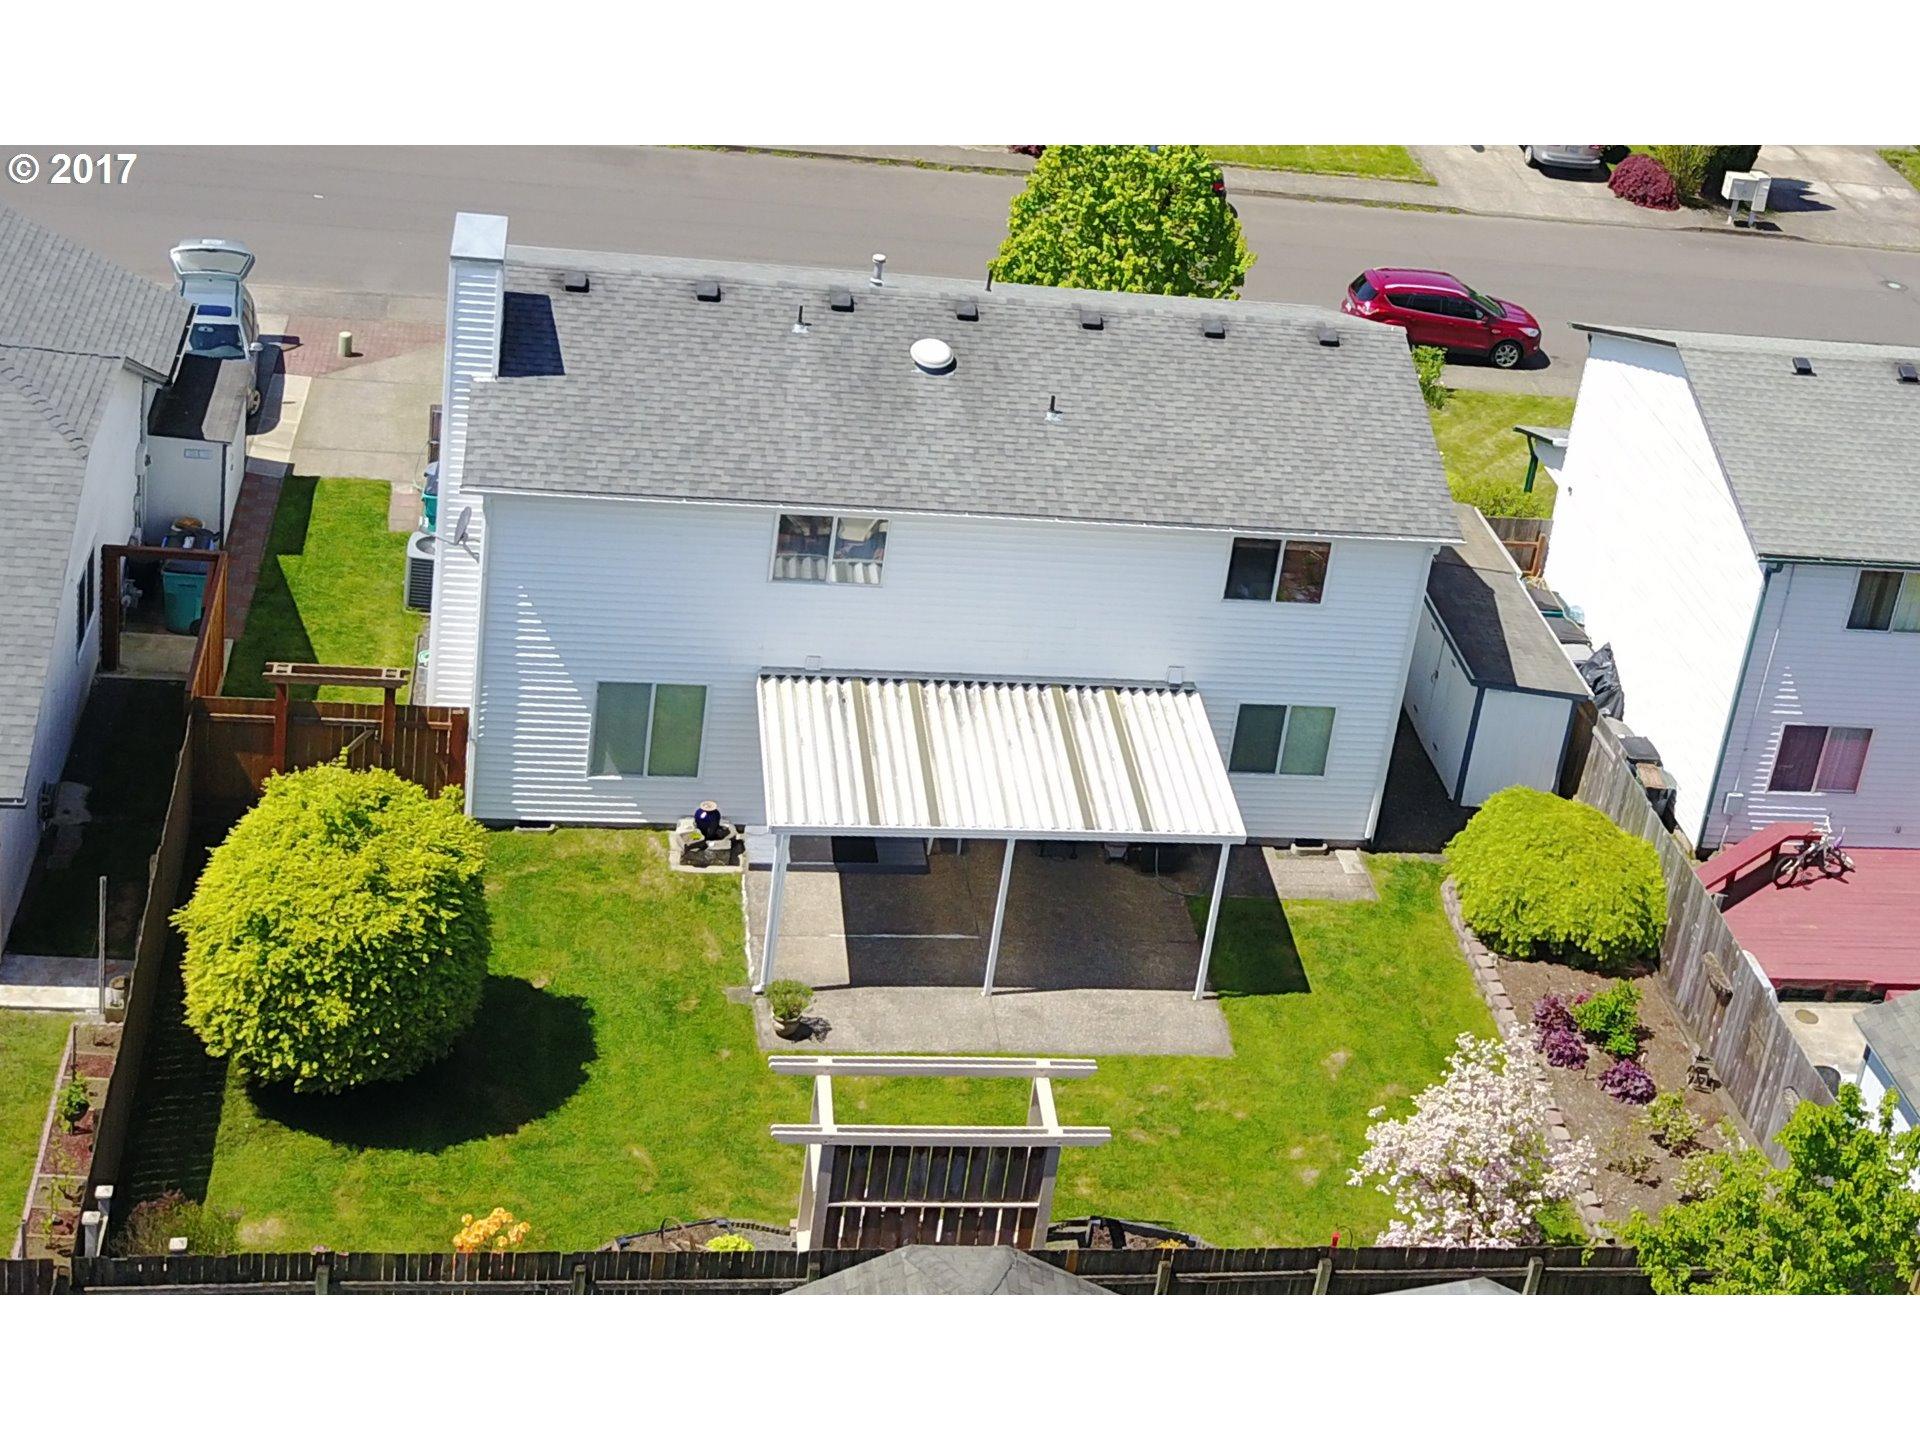 9511 NE 132ND AVE Vancouver, WA 98682 - MLS #: 17593693